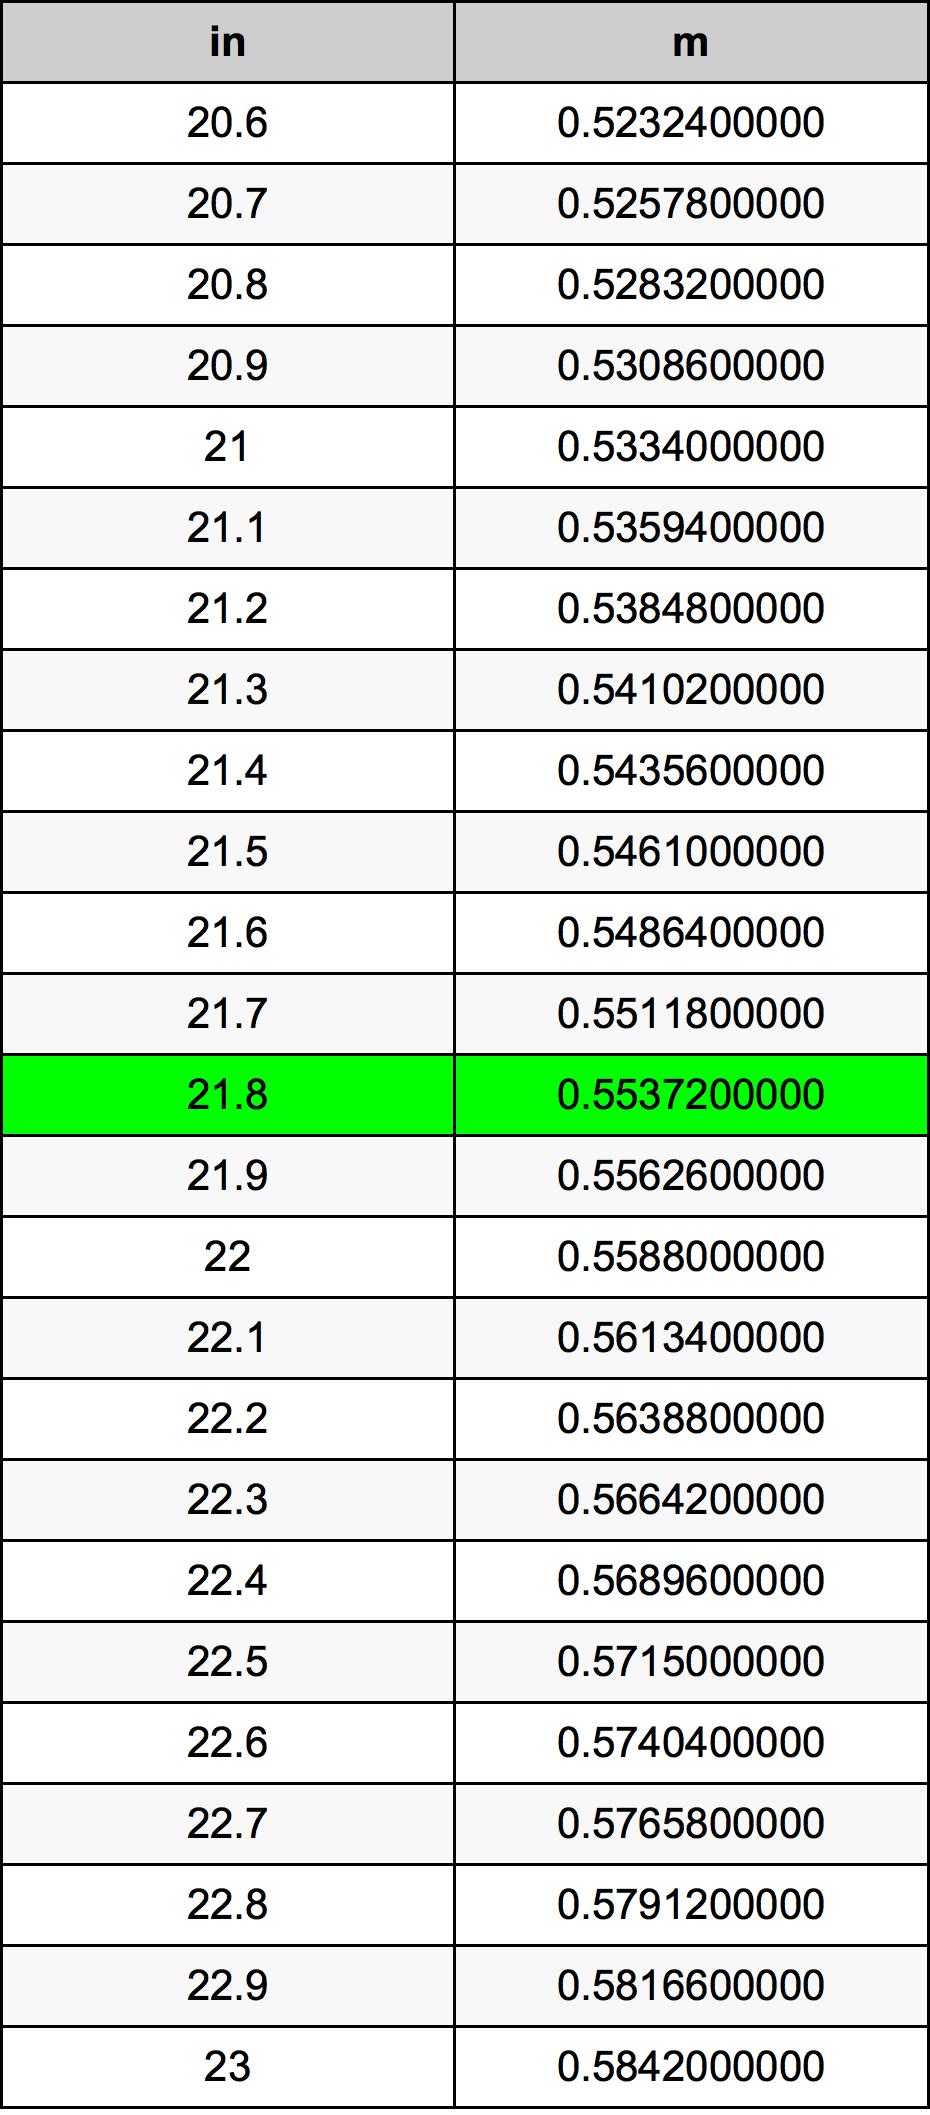 21.8 इंच रूपांतरण सारणी